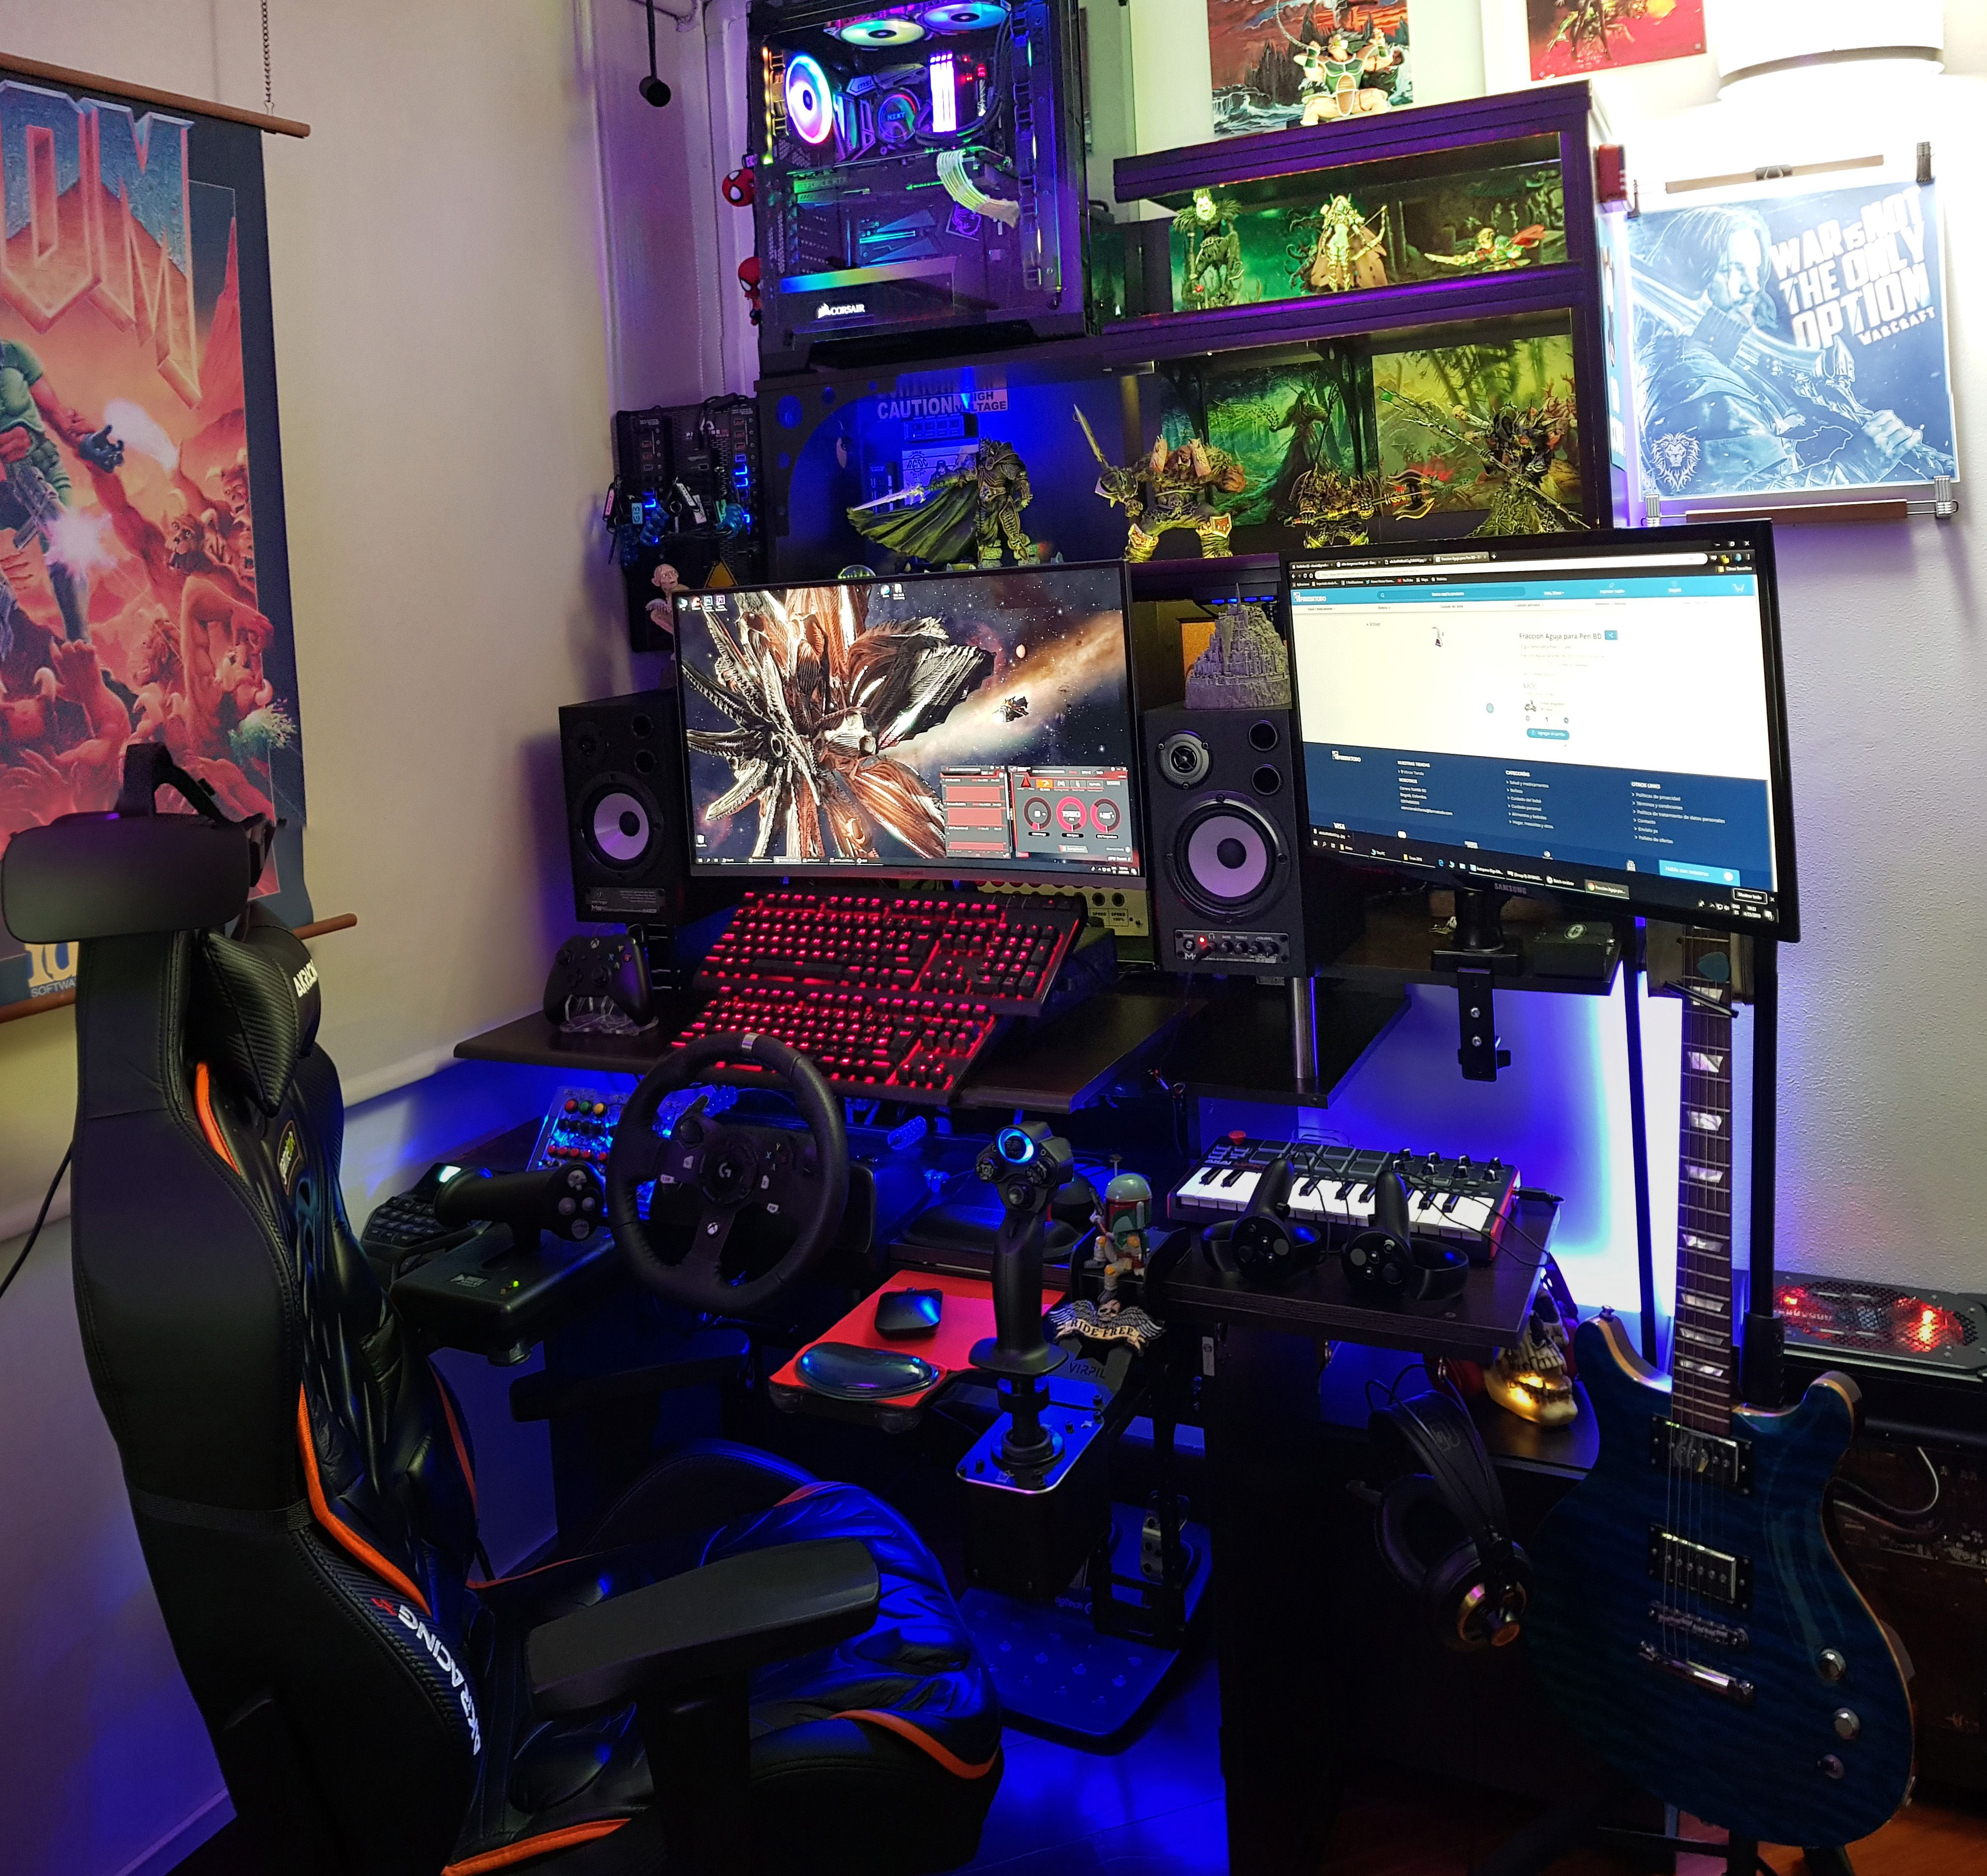 Gaming Desk Setup By Shucioh - Shucioh plays VR games